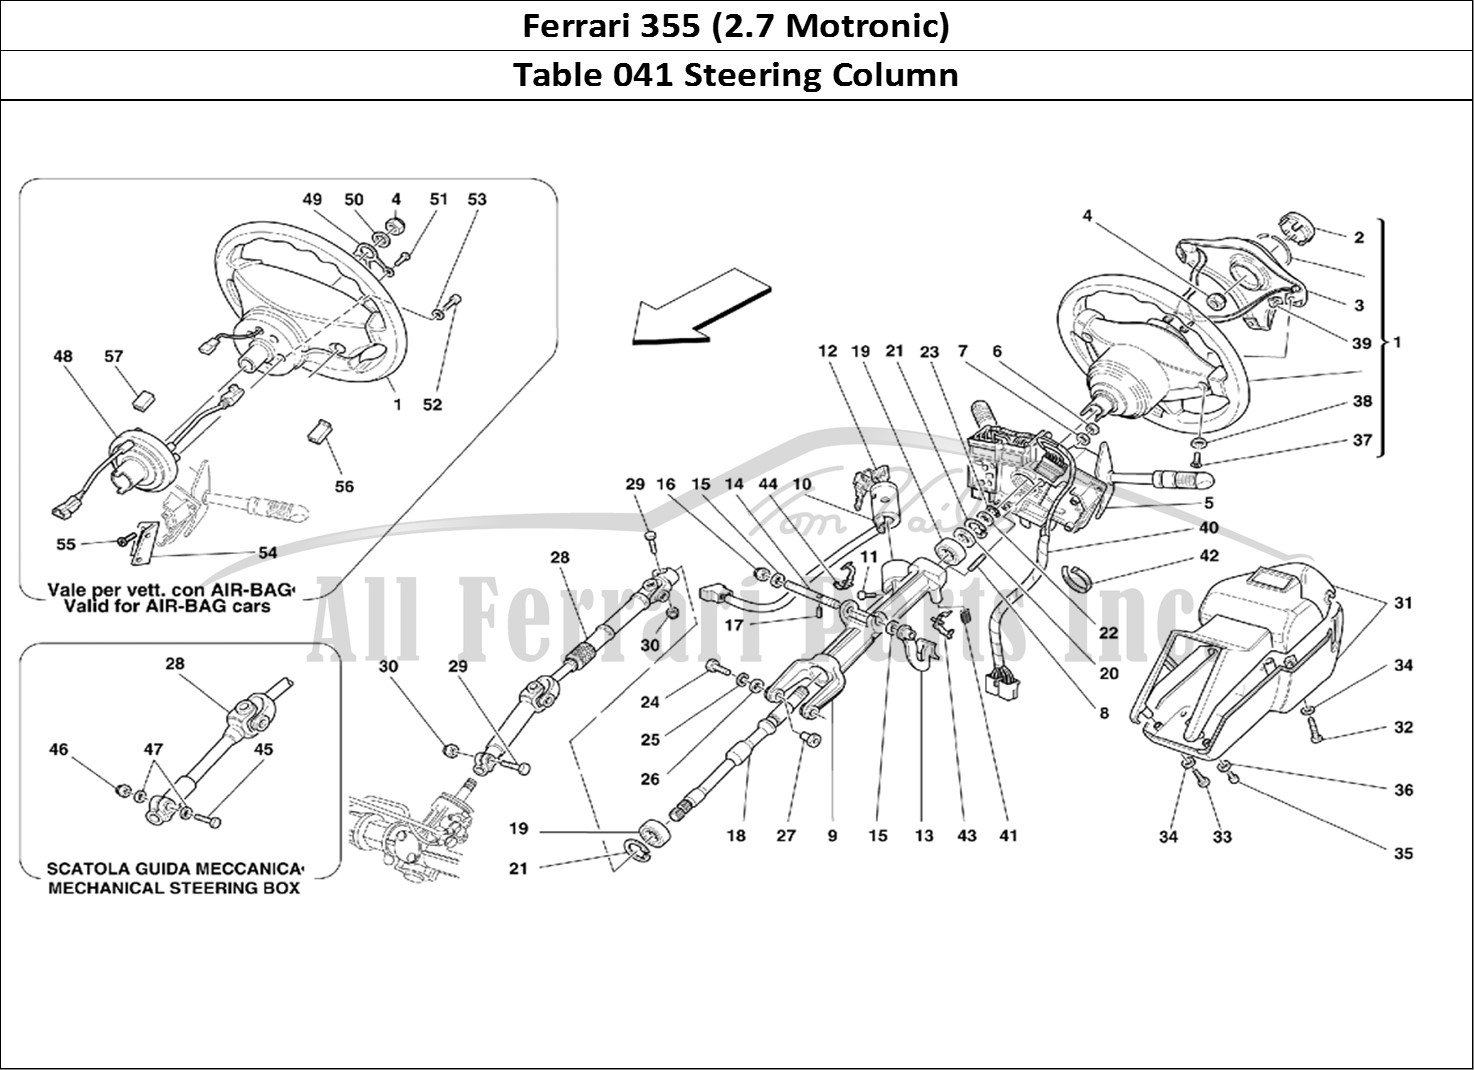 Buy Original Ferrari 355 2 7 Motronic 041 Steering